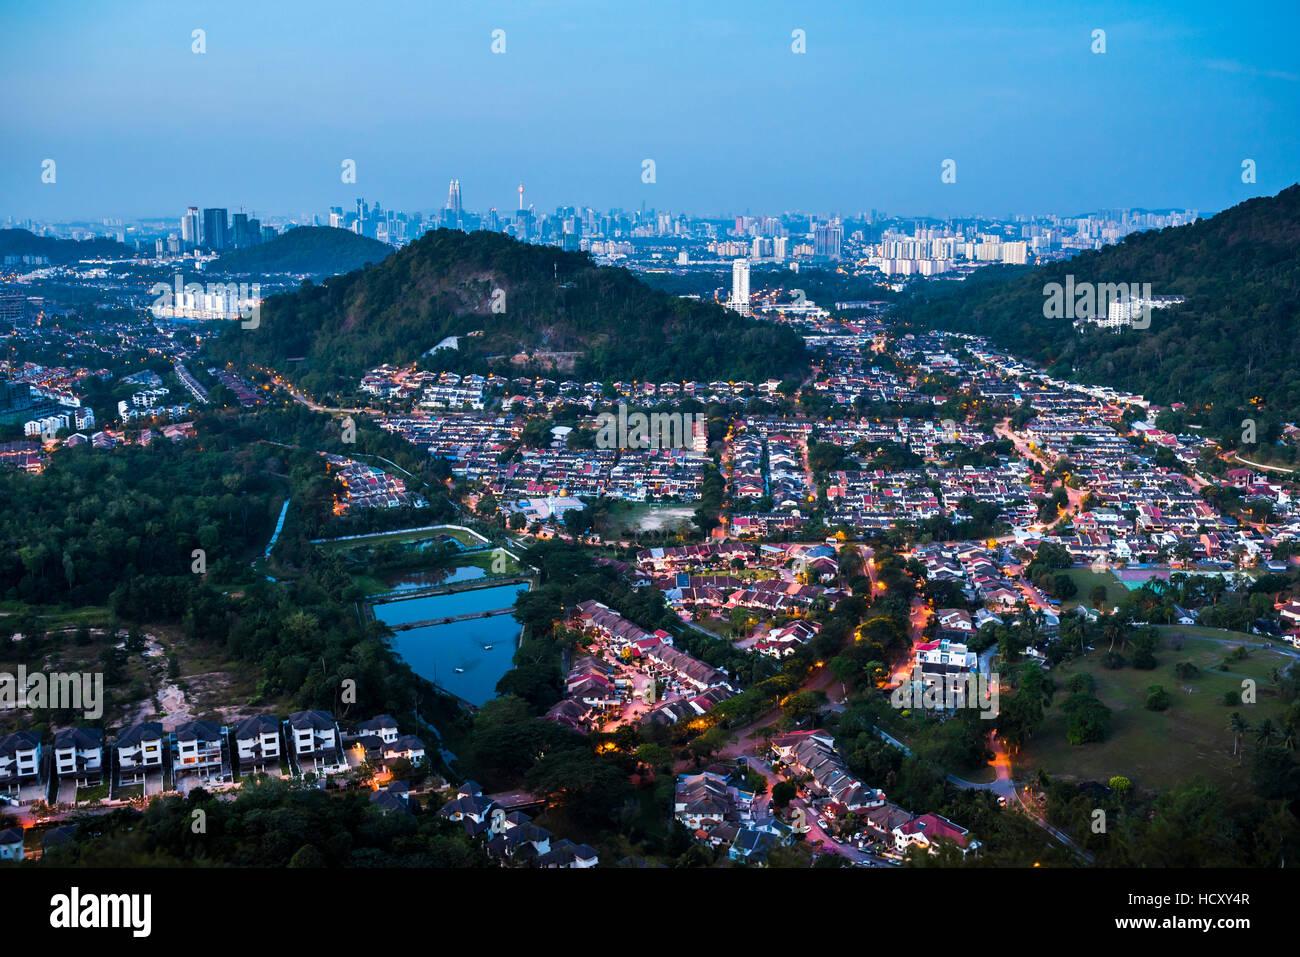 Kuala Lumpur skyline notturno visto da di Bukit Tabur Mountain, Malaysia Immagini Stock